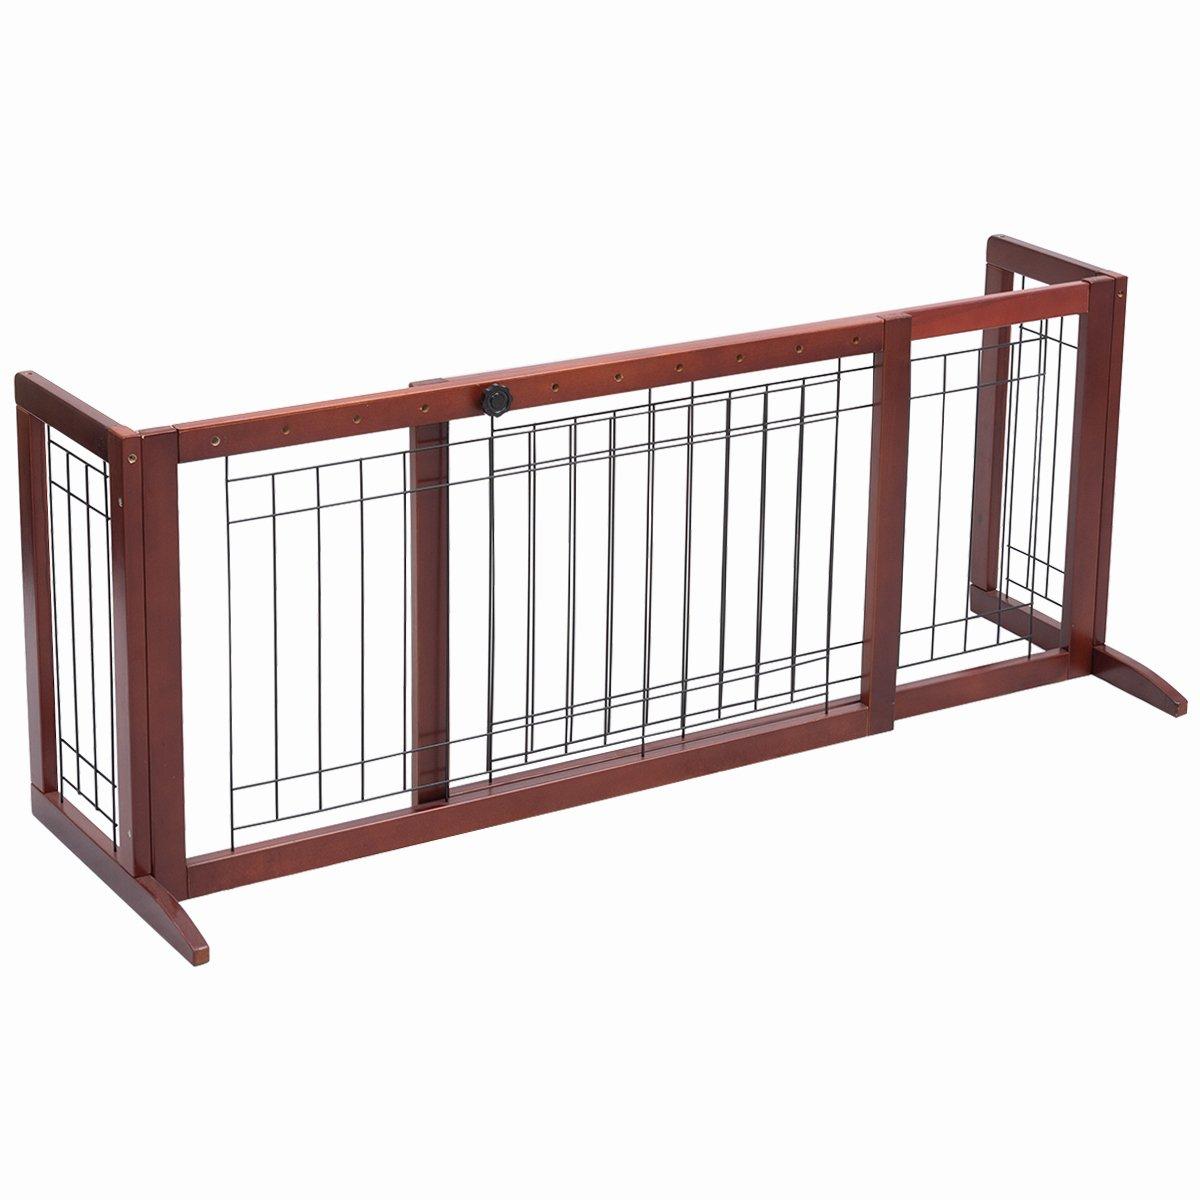 Giantex Adjustable Wooden Dog Gate Pet Fence Safety Folding Panel Freestanding